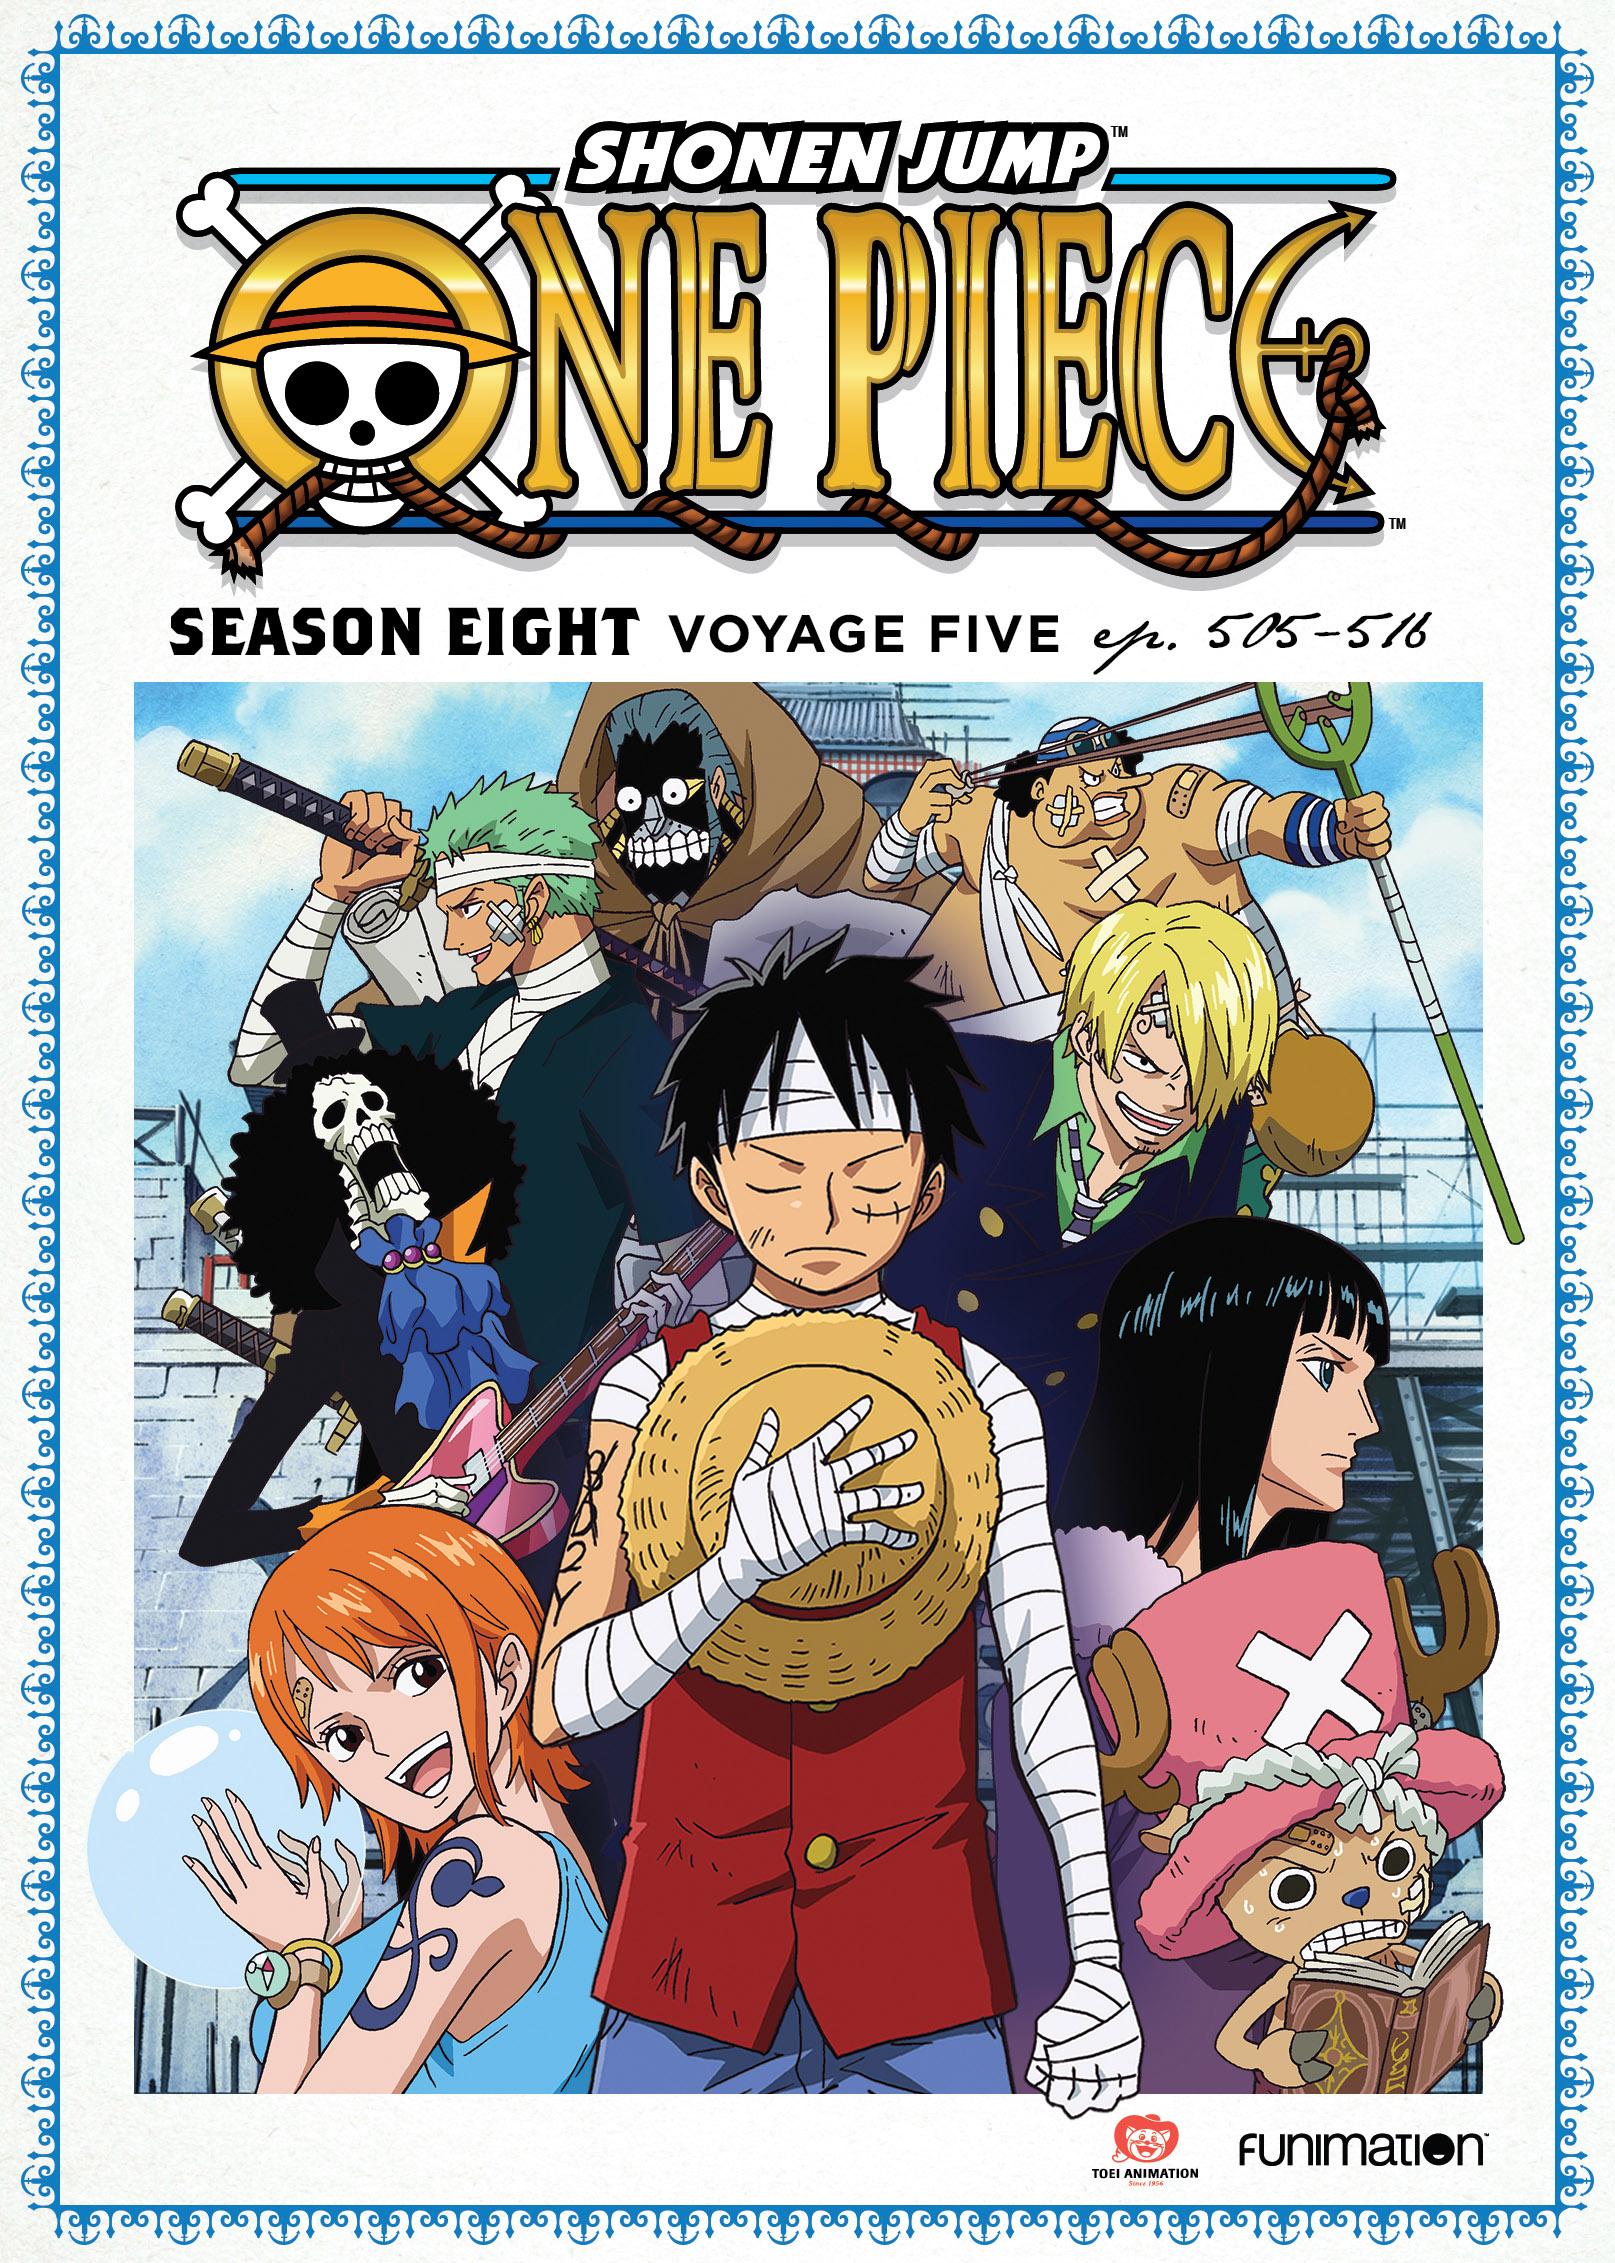 one piece season 8 free